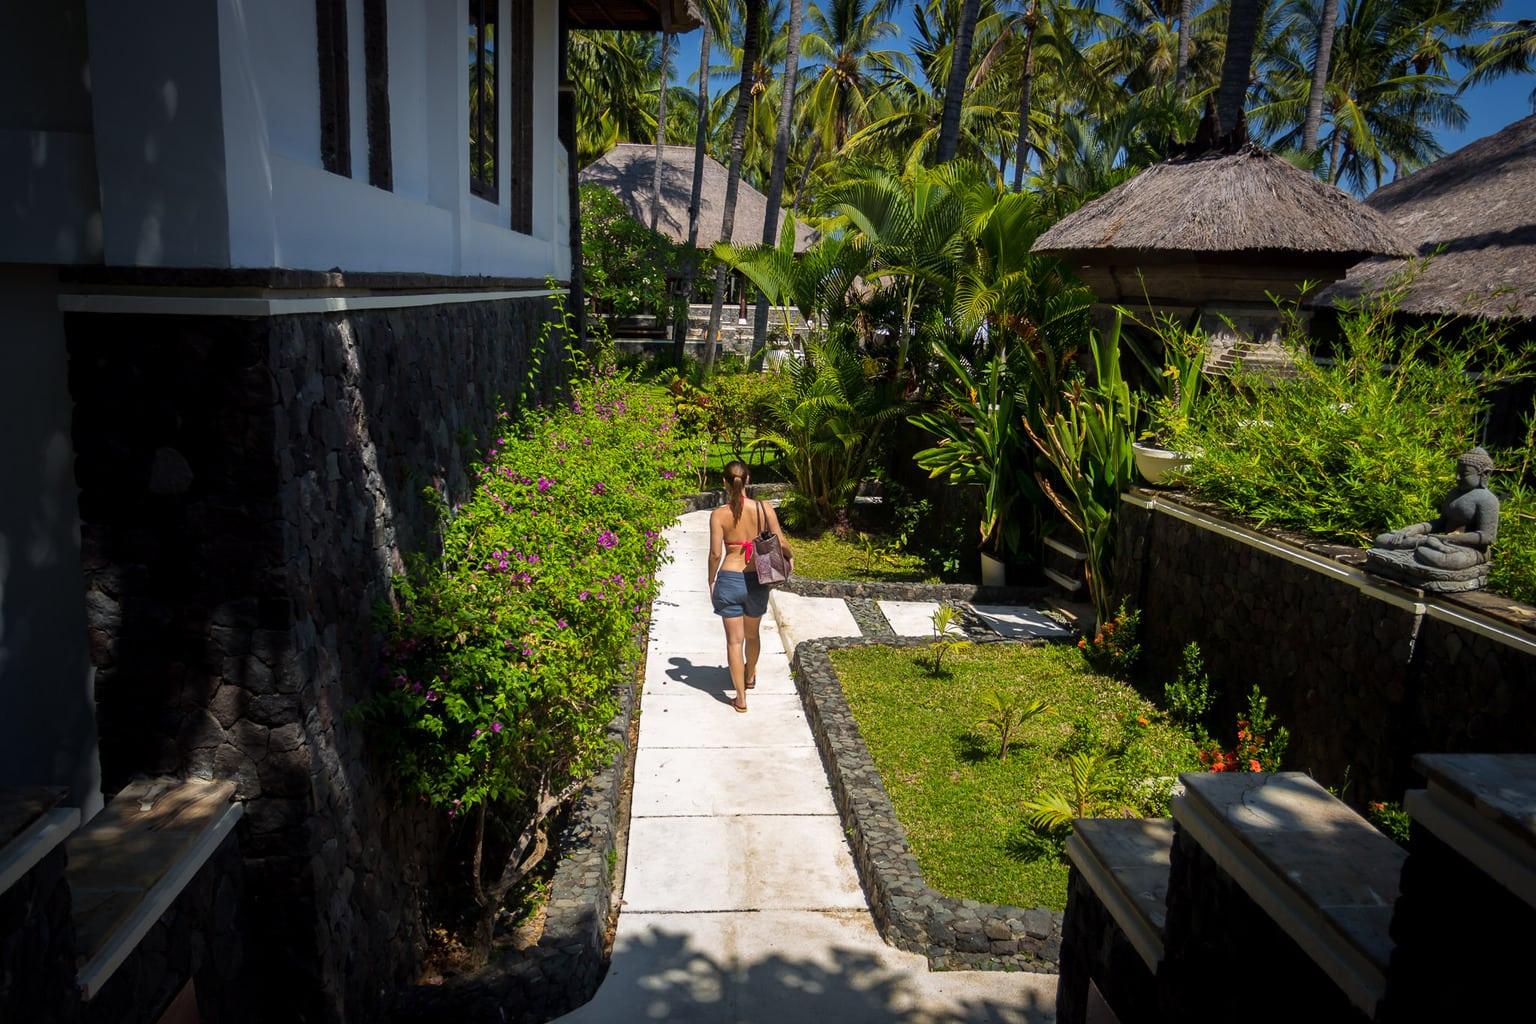 Walking among the beach villas